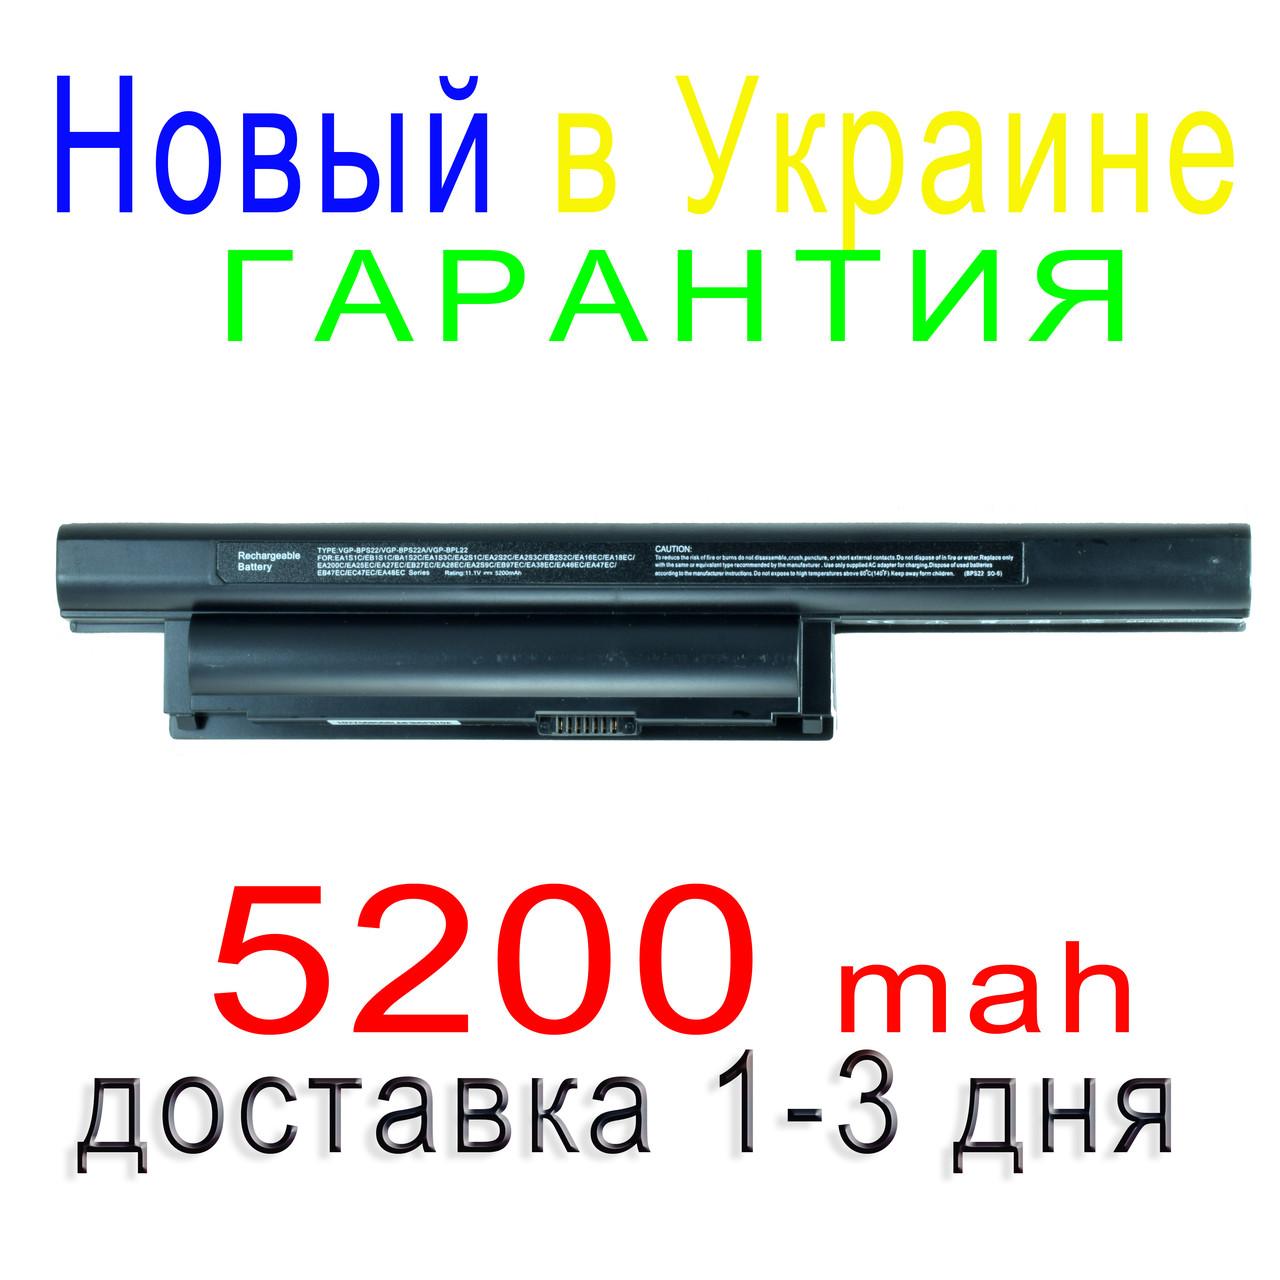 Аккумулятор батарея SONY VAIO VGP-BPL22 VPC-EB22 VPC-EA36 SONYVGP-BPS2